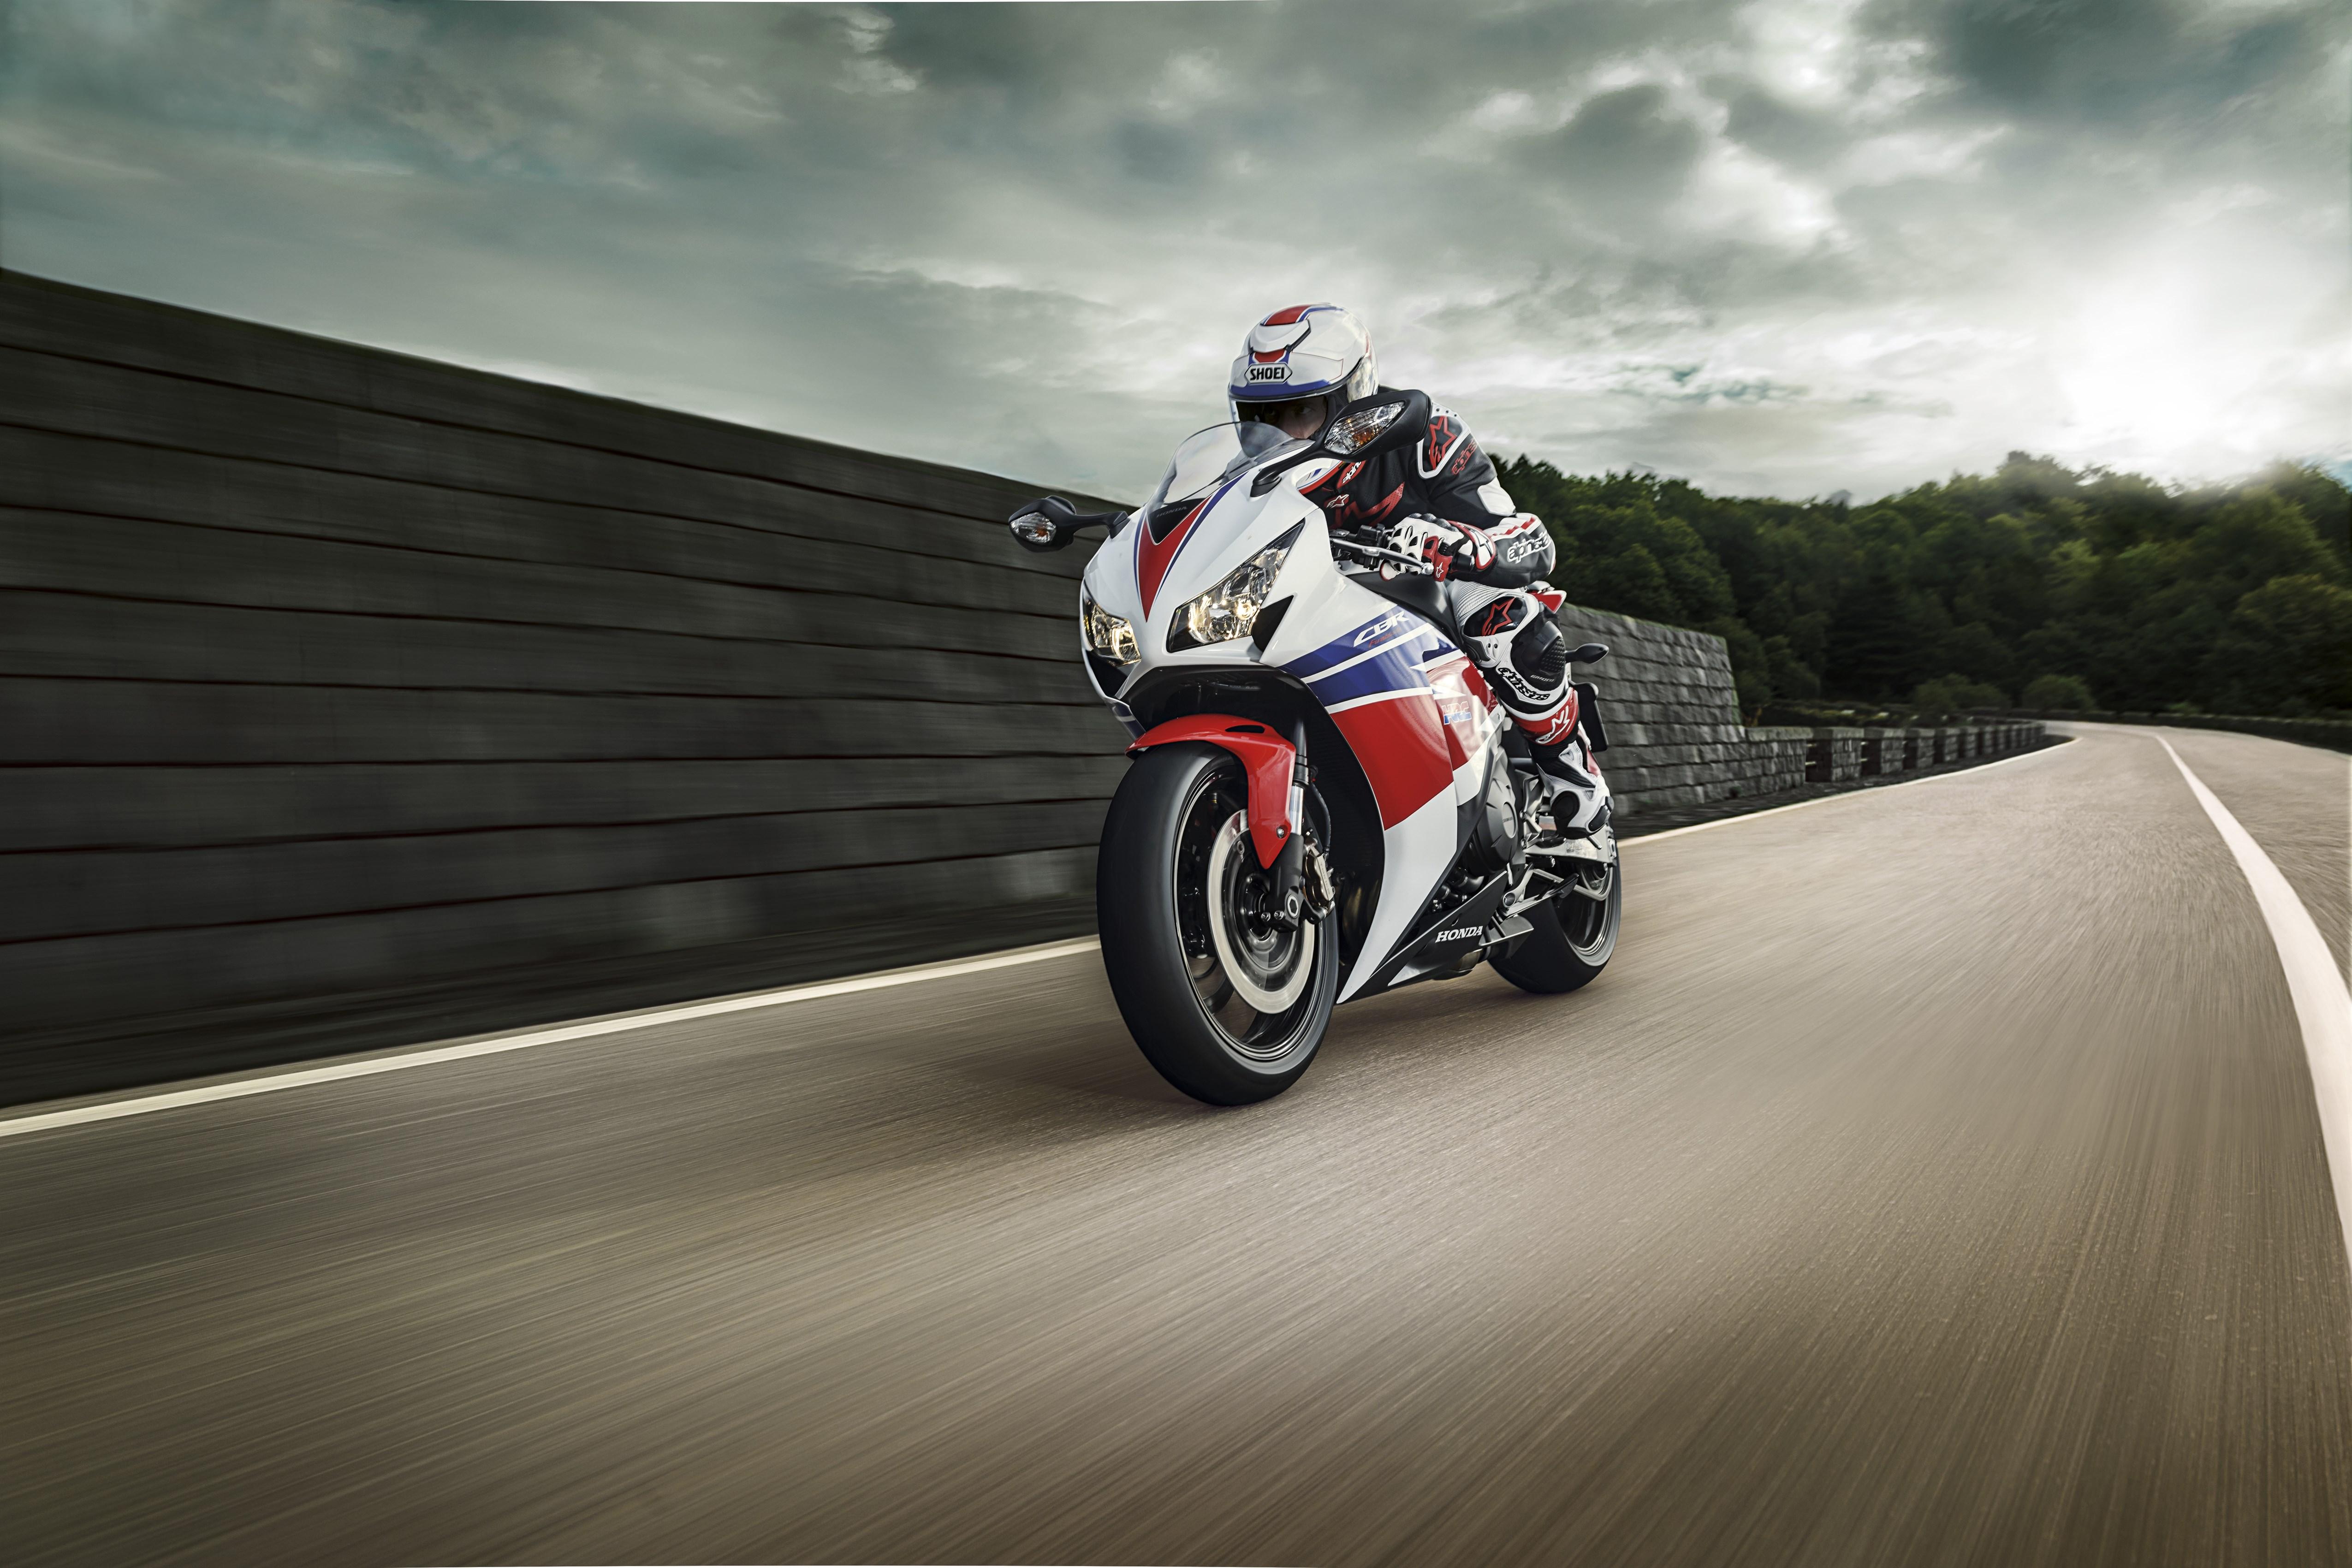 Honda-CBR1000RR-2014-Fireblade